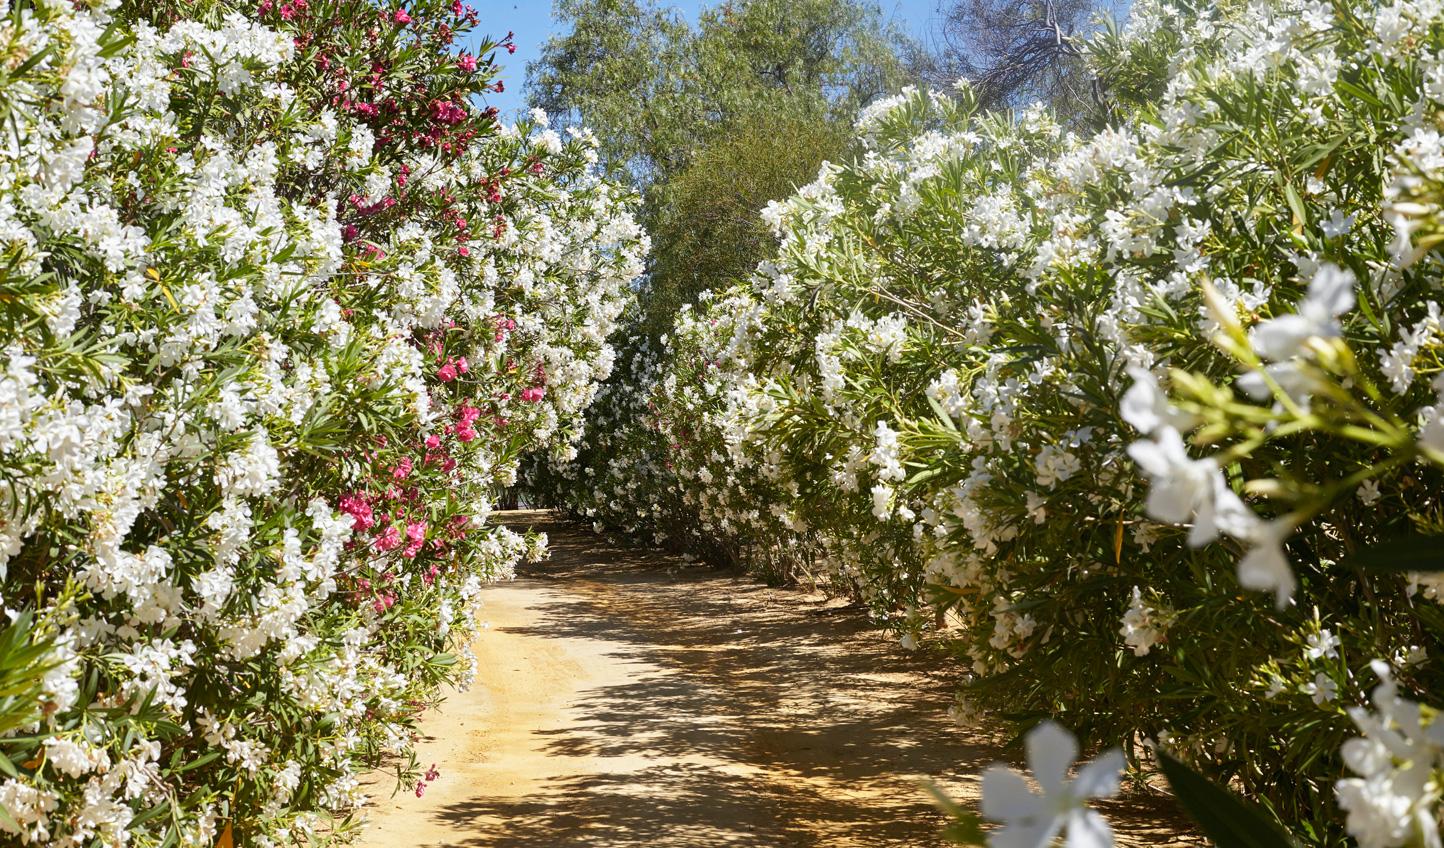 Take a stroll through the beautiful gardens of Hacienda San Rafael